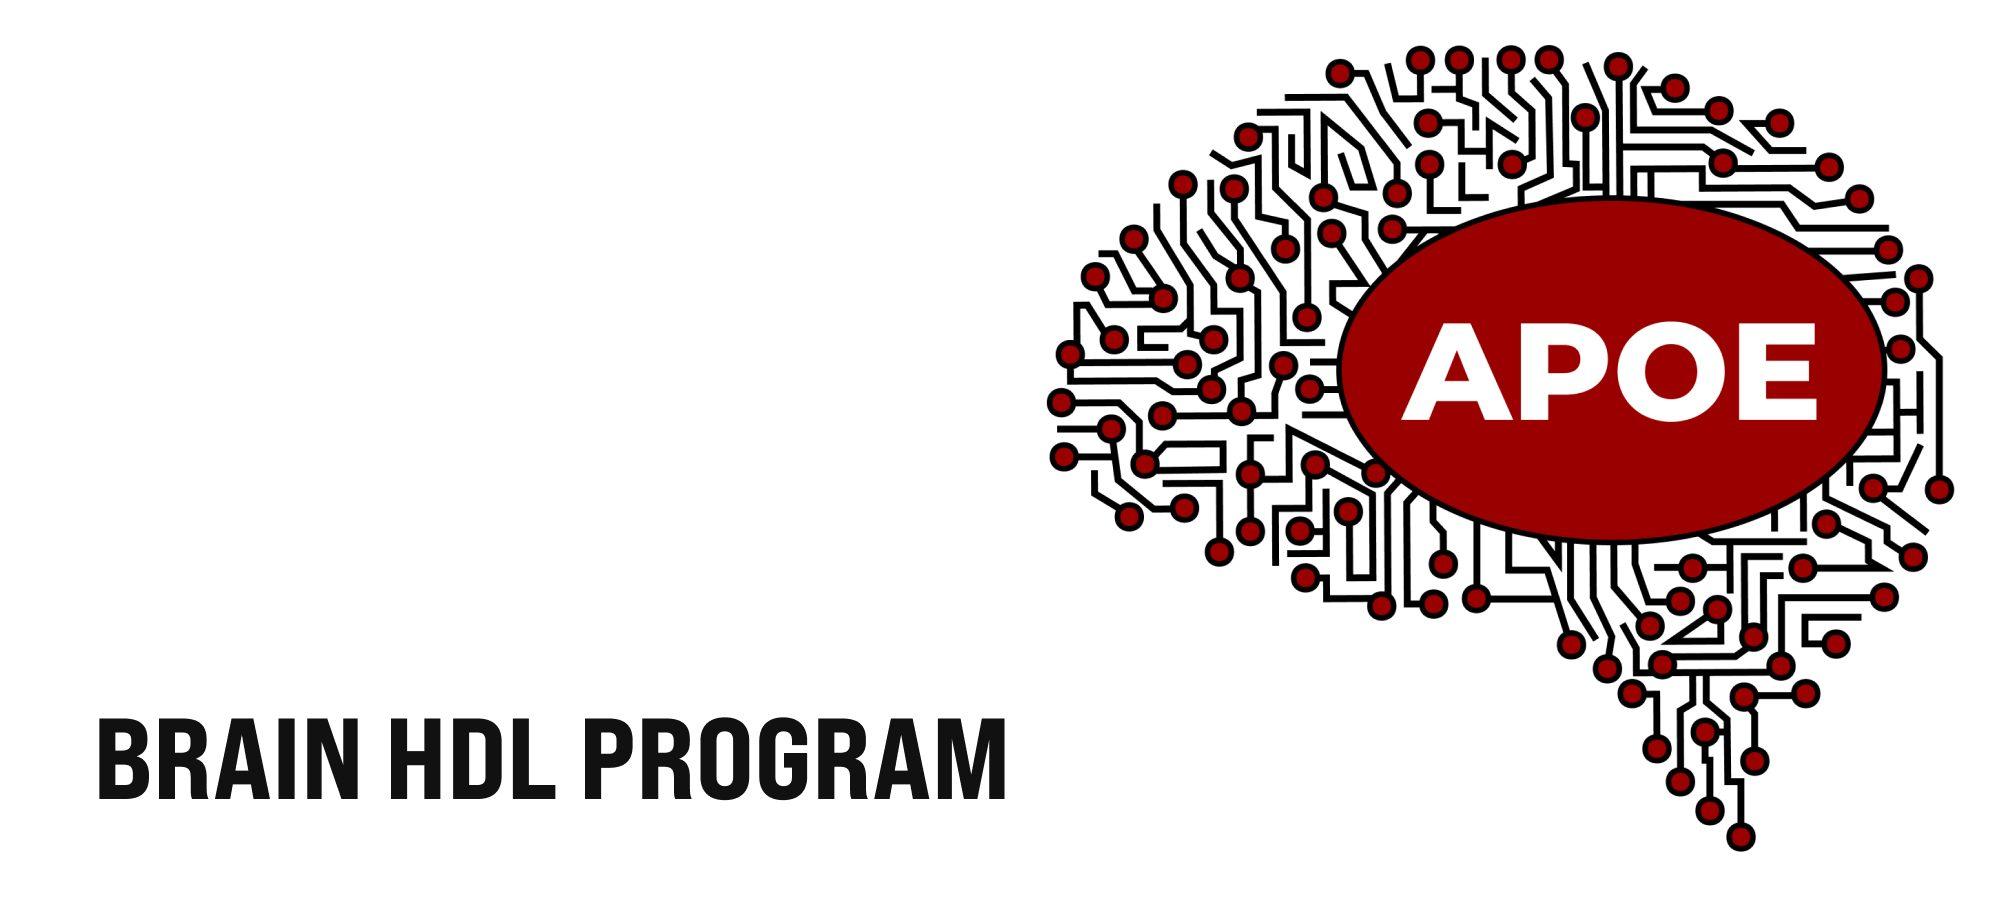 Brain HDL Program large